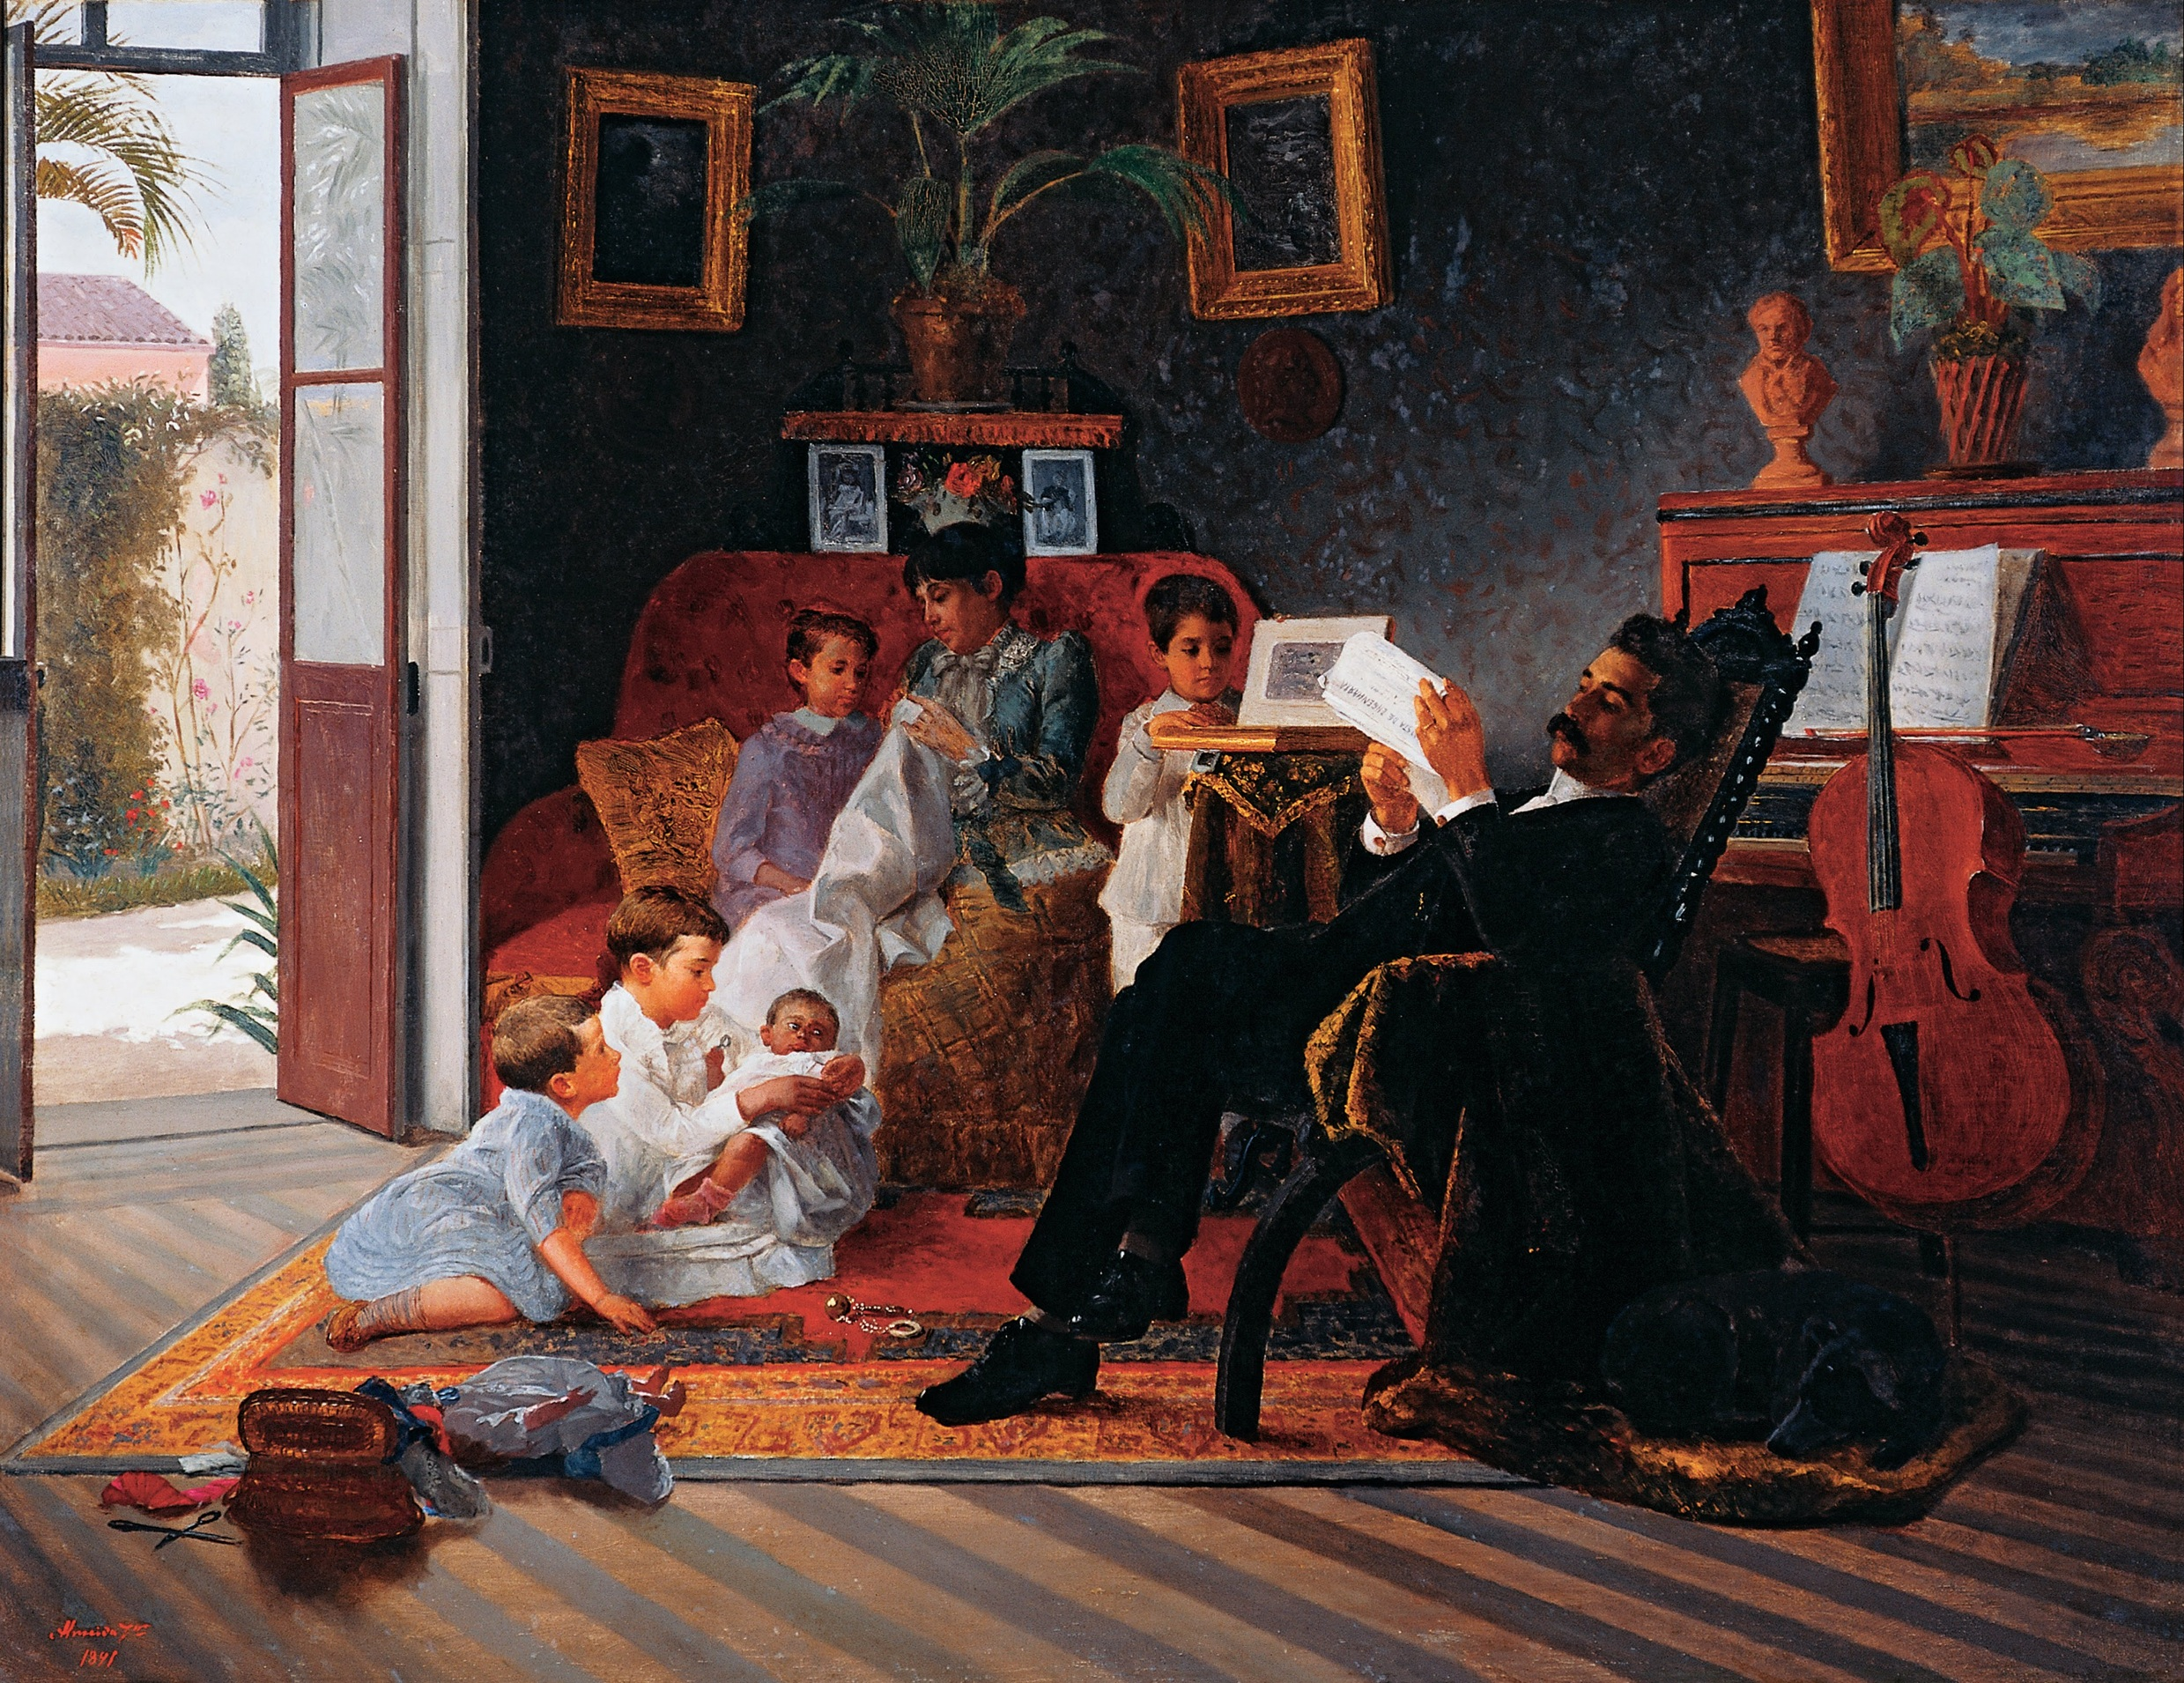 File:Almeida Júnior - Cena de Família de Adolfo Augusto Pinto, 1891.JPG